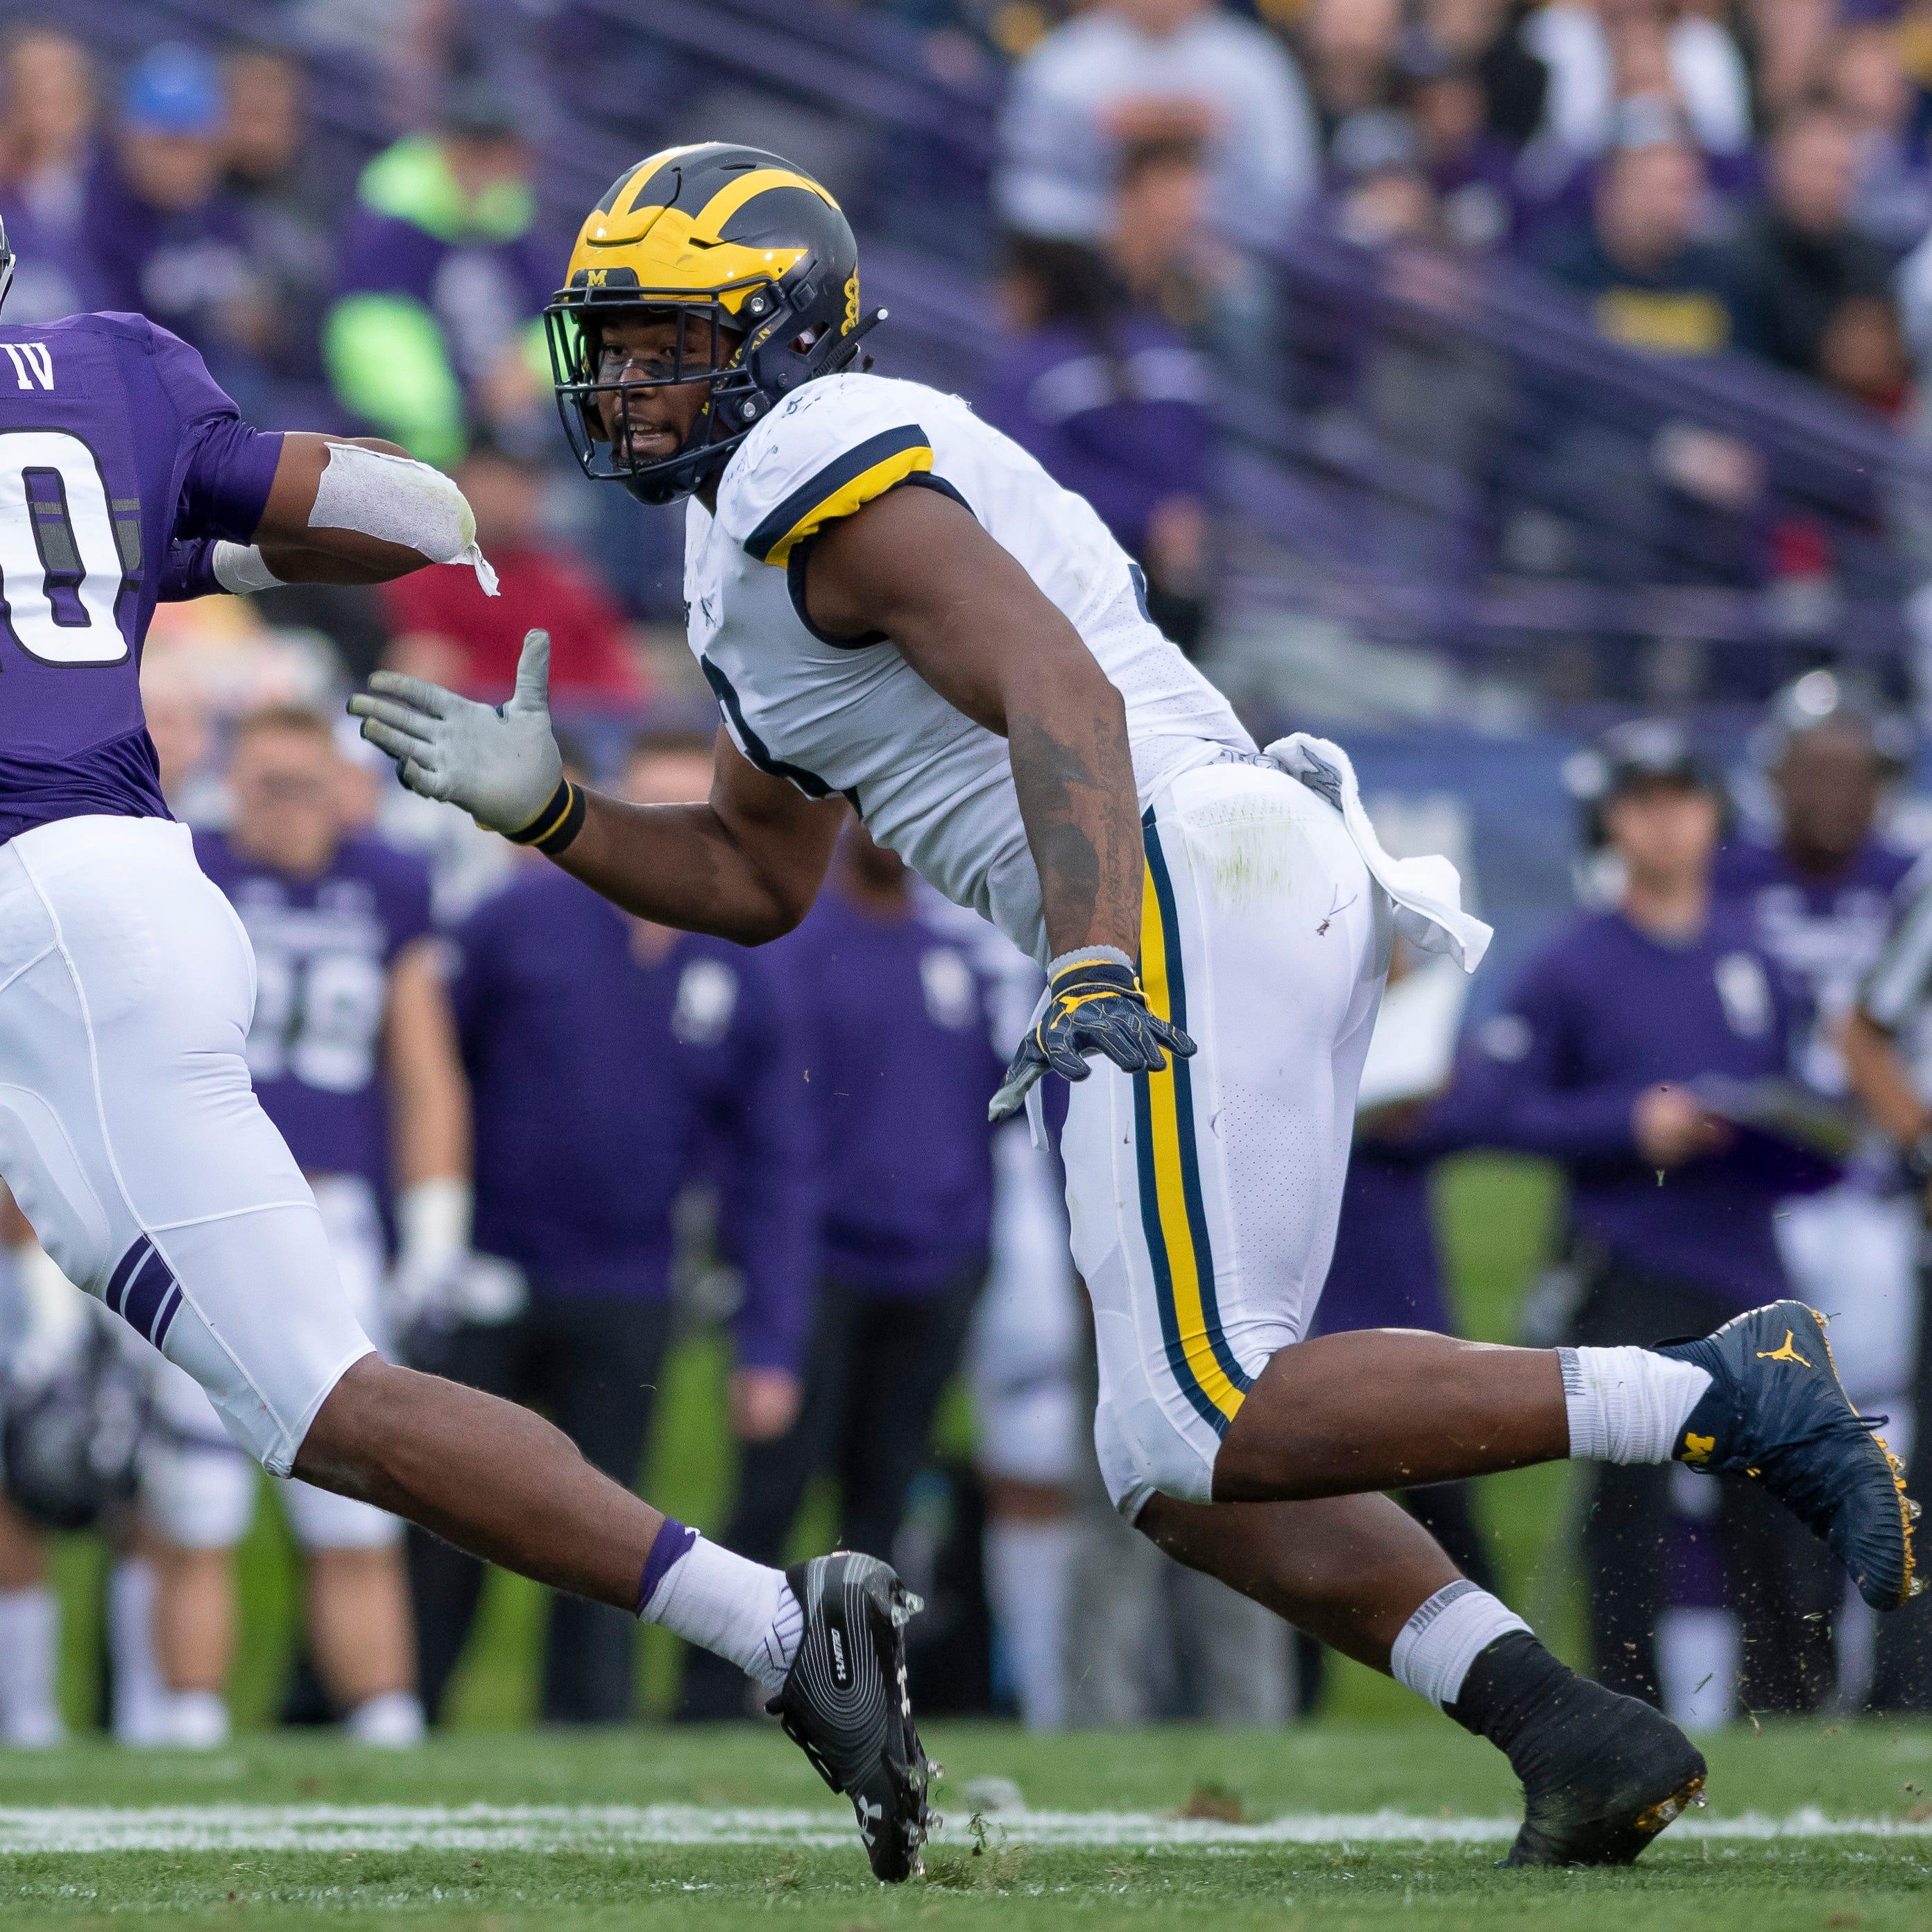 Lions go for Michigan's Rashan Gary in mock draft